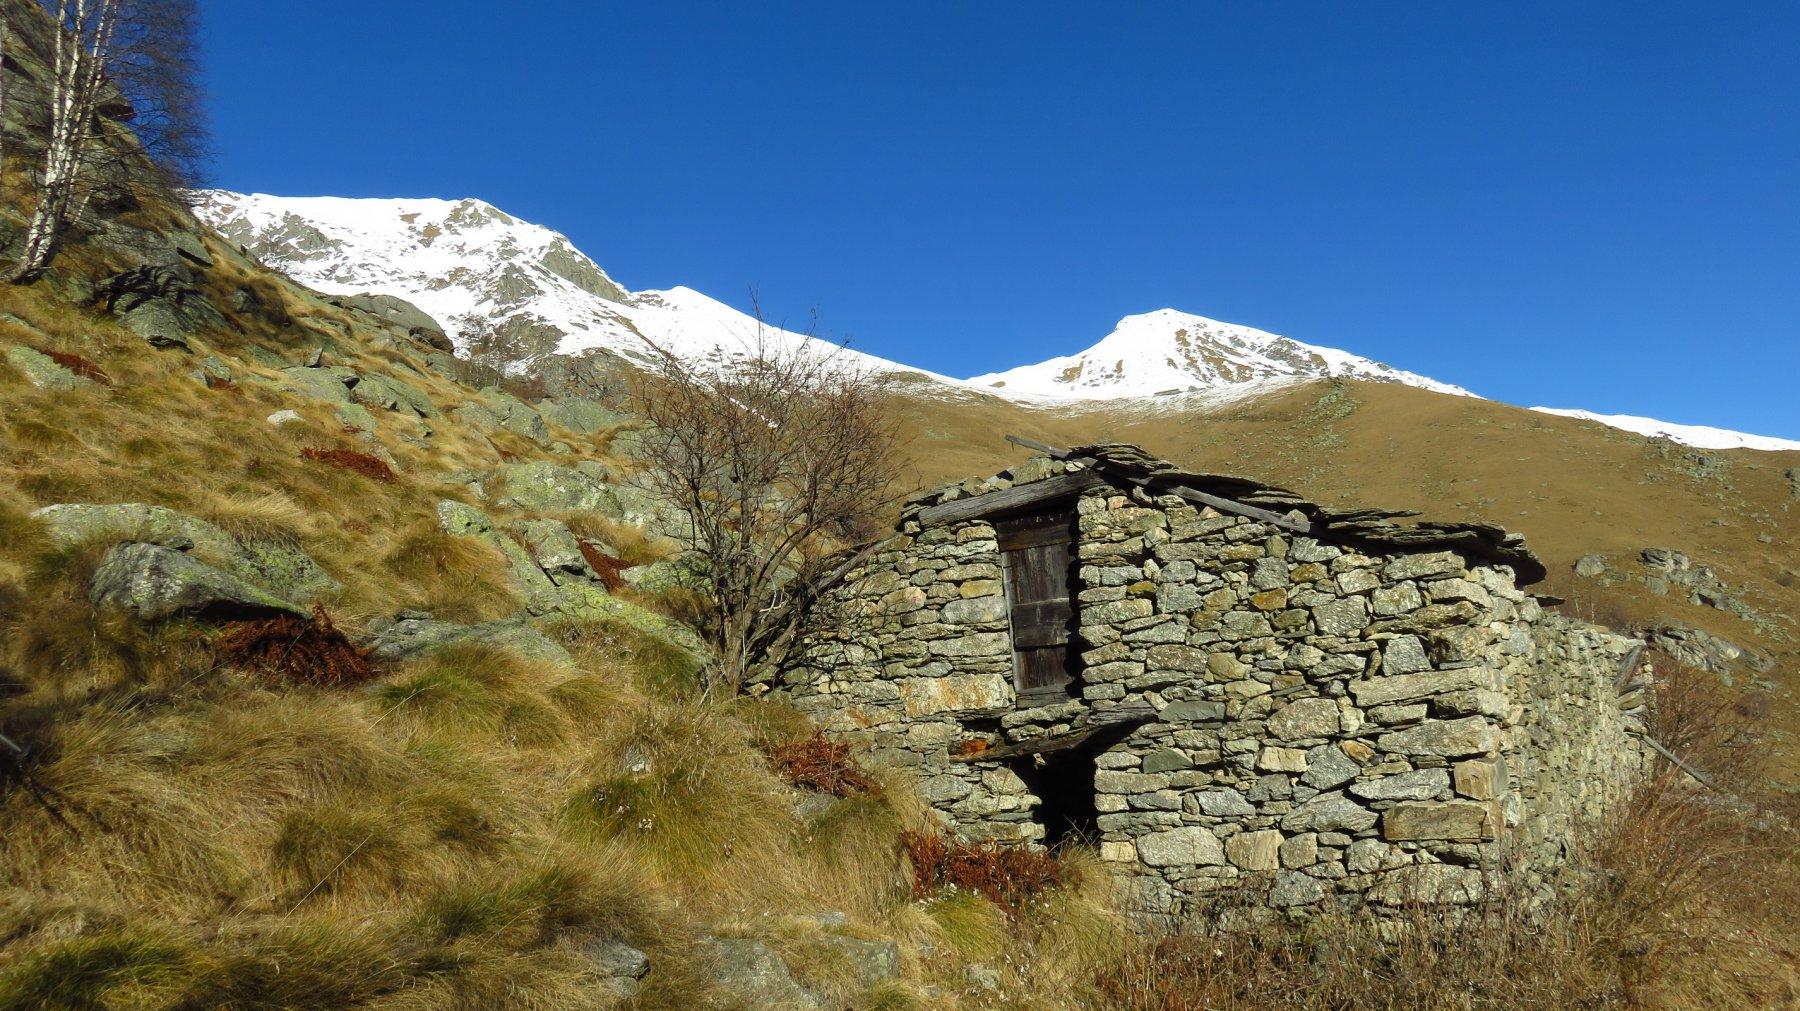 Ruderi all'Alpe Timolai